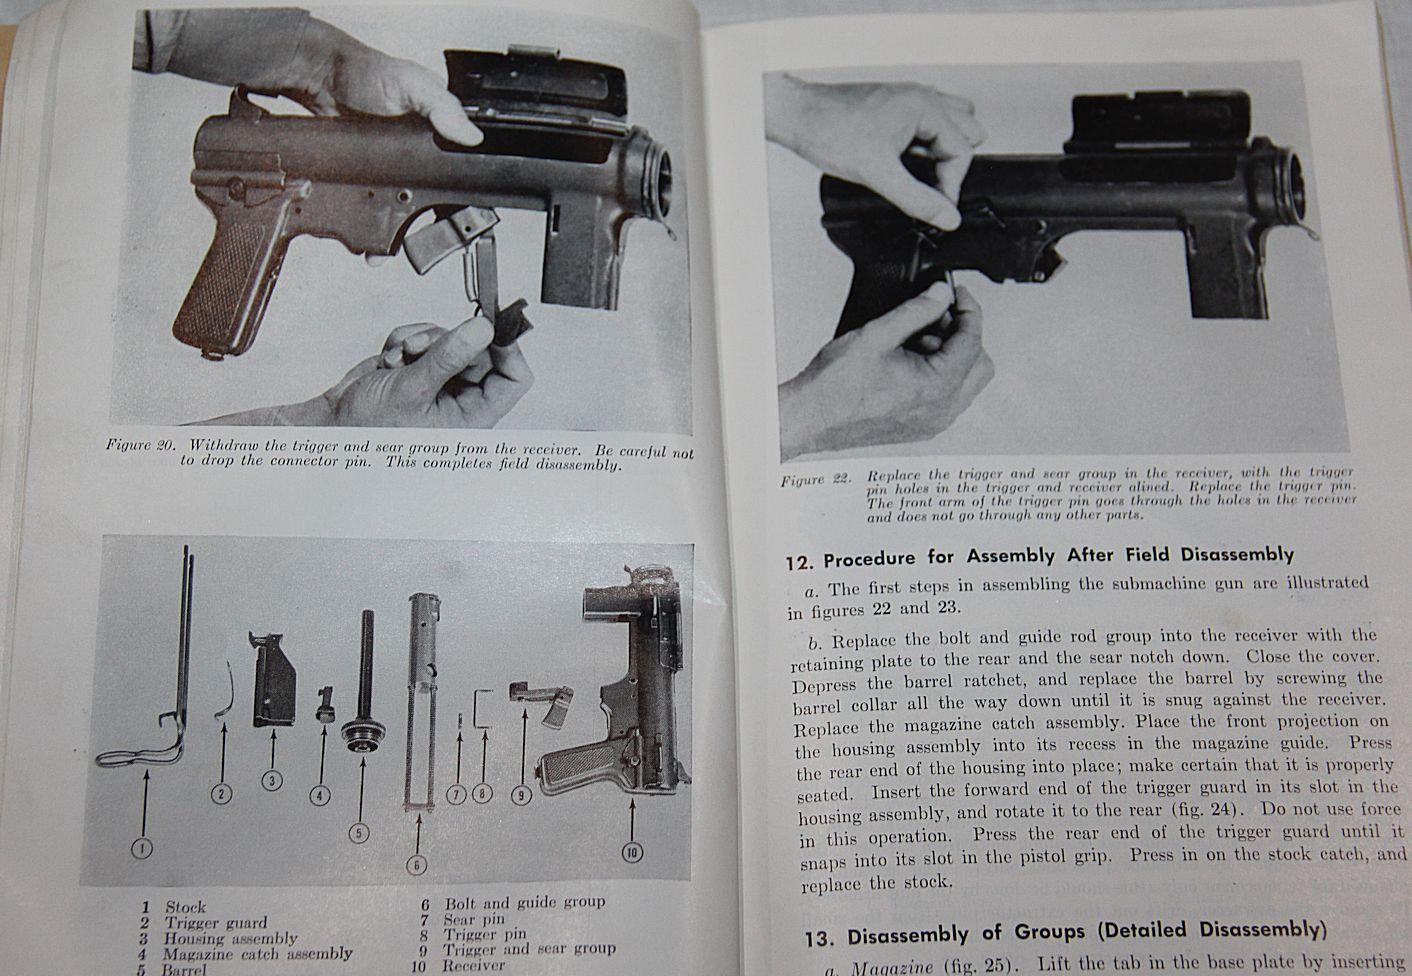 Sears gun manuals ebook array m3 grease gun manual product user guide instruction u2022 rh testdpc co fandeluxe Gallery